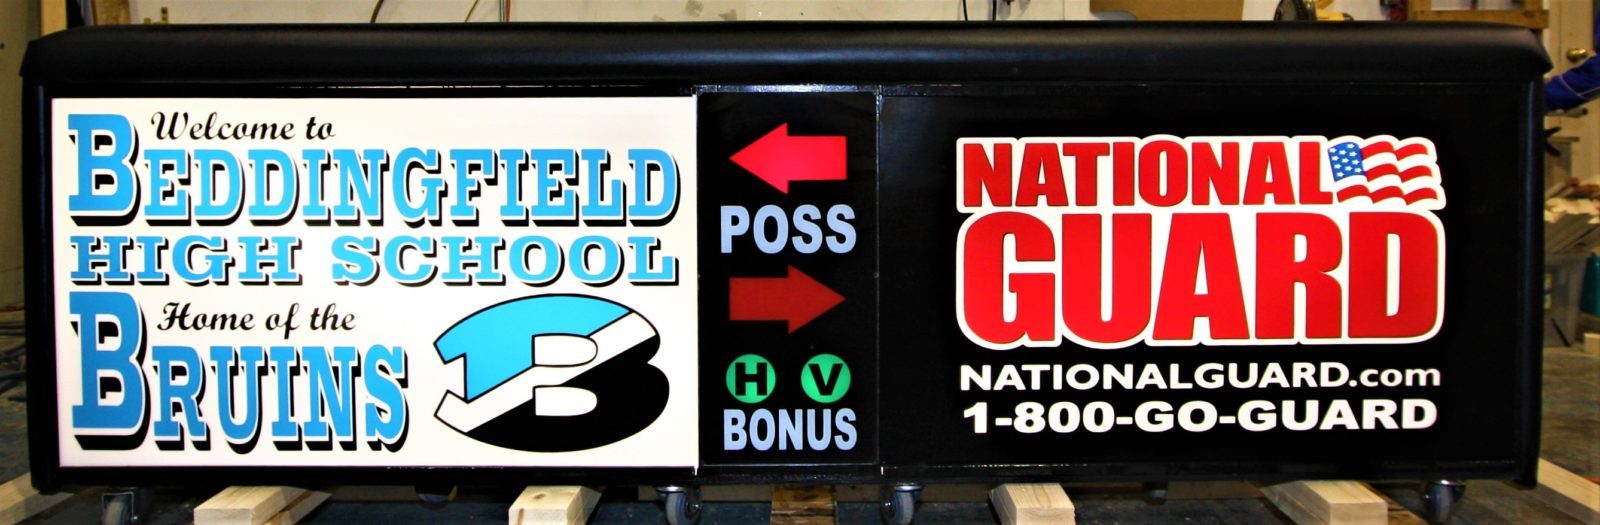 Beddingfield high school scoring table North Carolina Army National Guard NCARNG